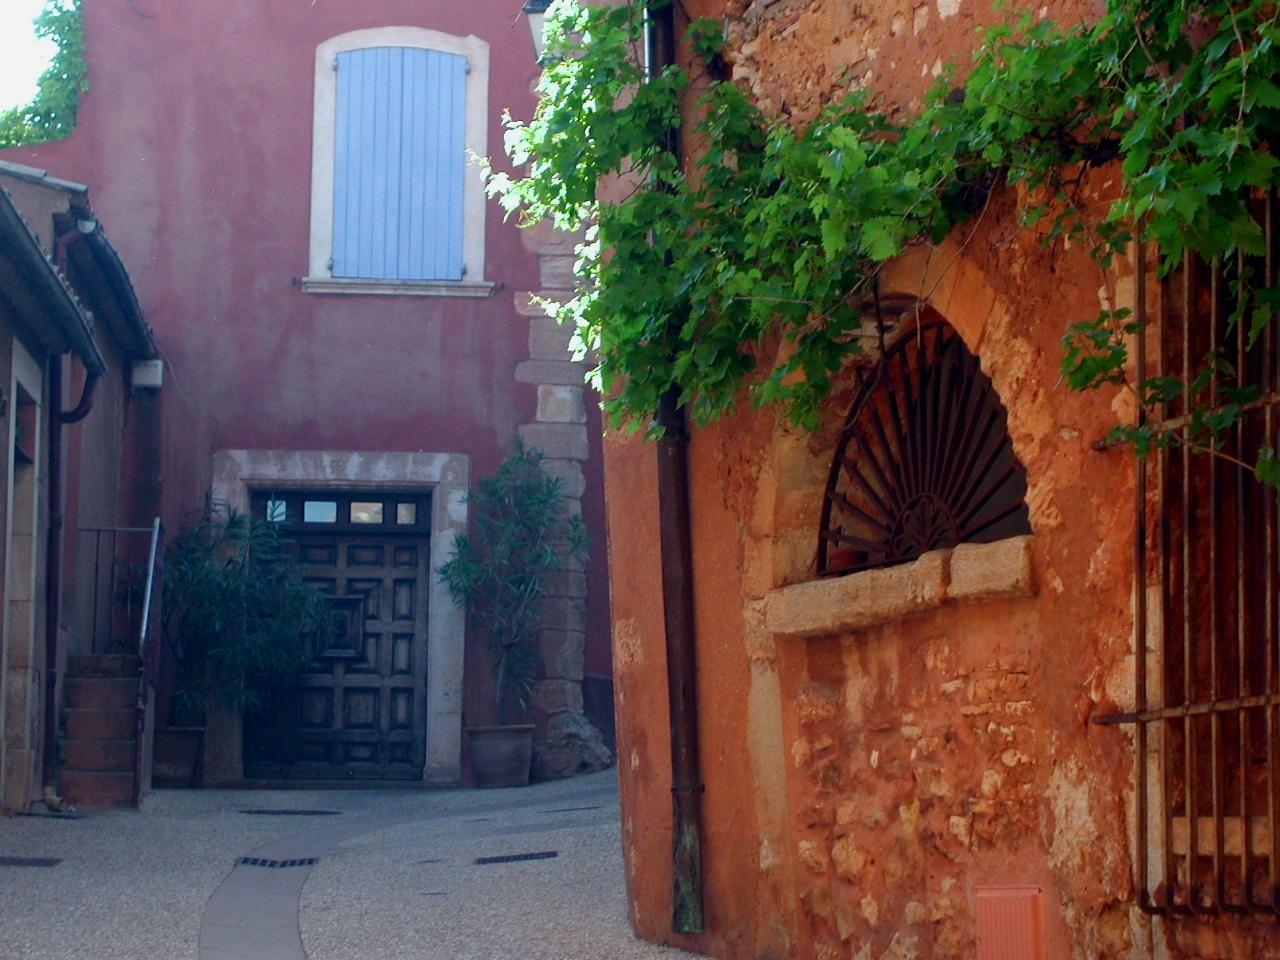 Roussillon Walls.JPG